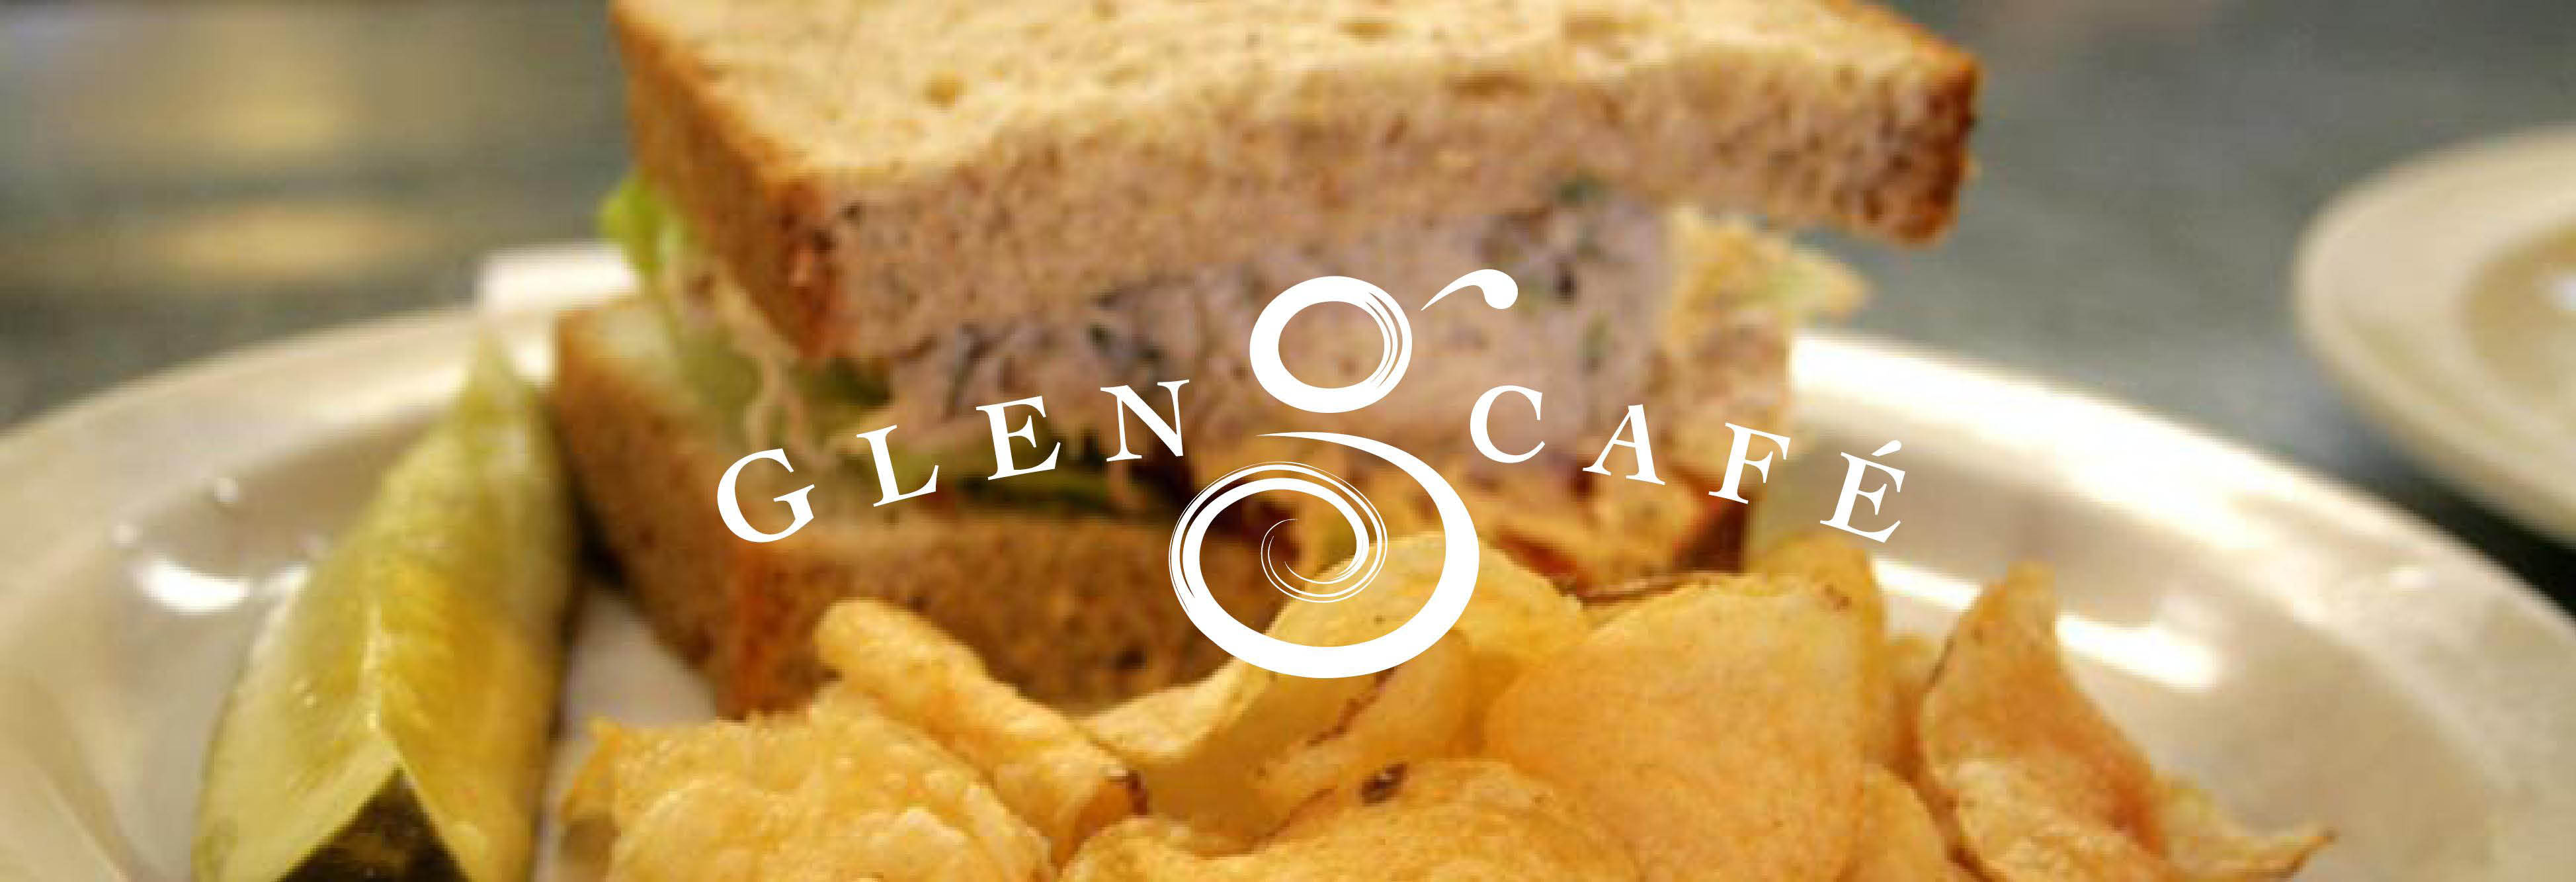 The Glen Cafe Logo in Glendale Wisconsin breakfast, Lunch, dinner